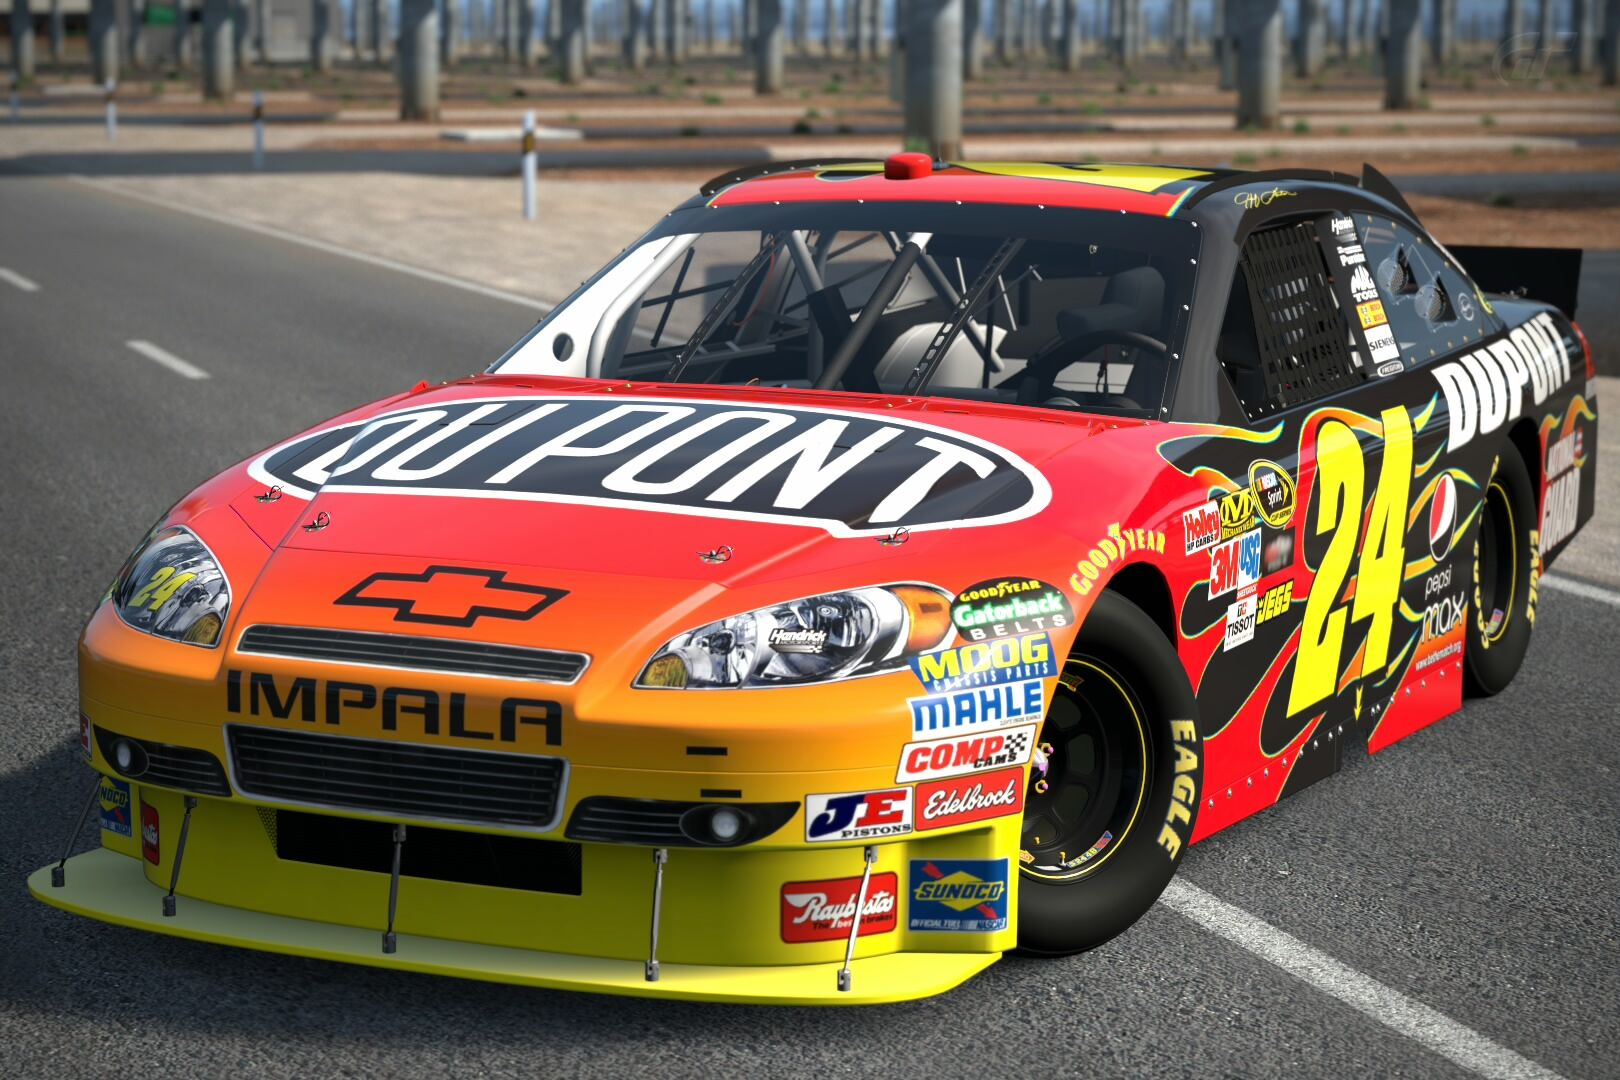 Jeff Gordon Chevrolet >> 2010 Jeff Gordon ♯24 DuPont CHEVROLET IMPALA '10 | Gran Turismo Wiki | FANDOM powered by Wikia